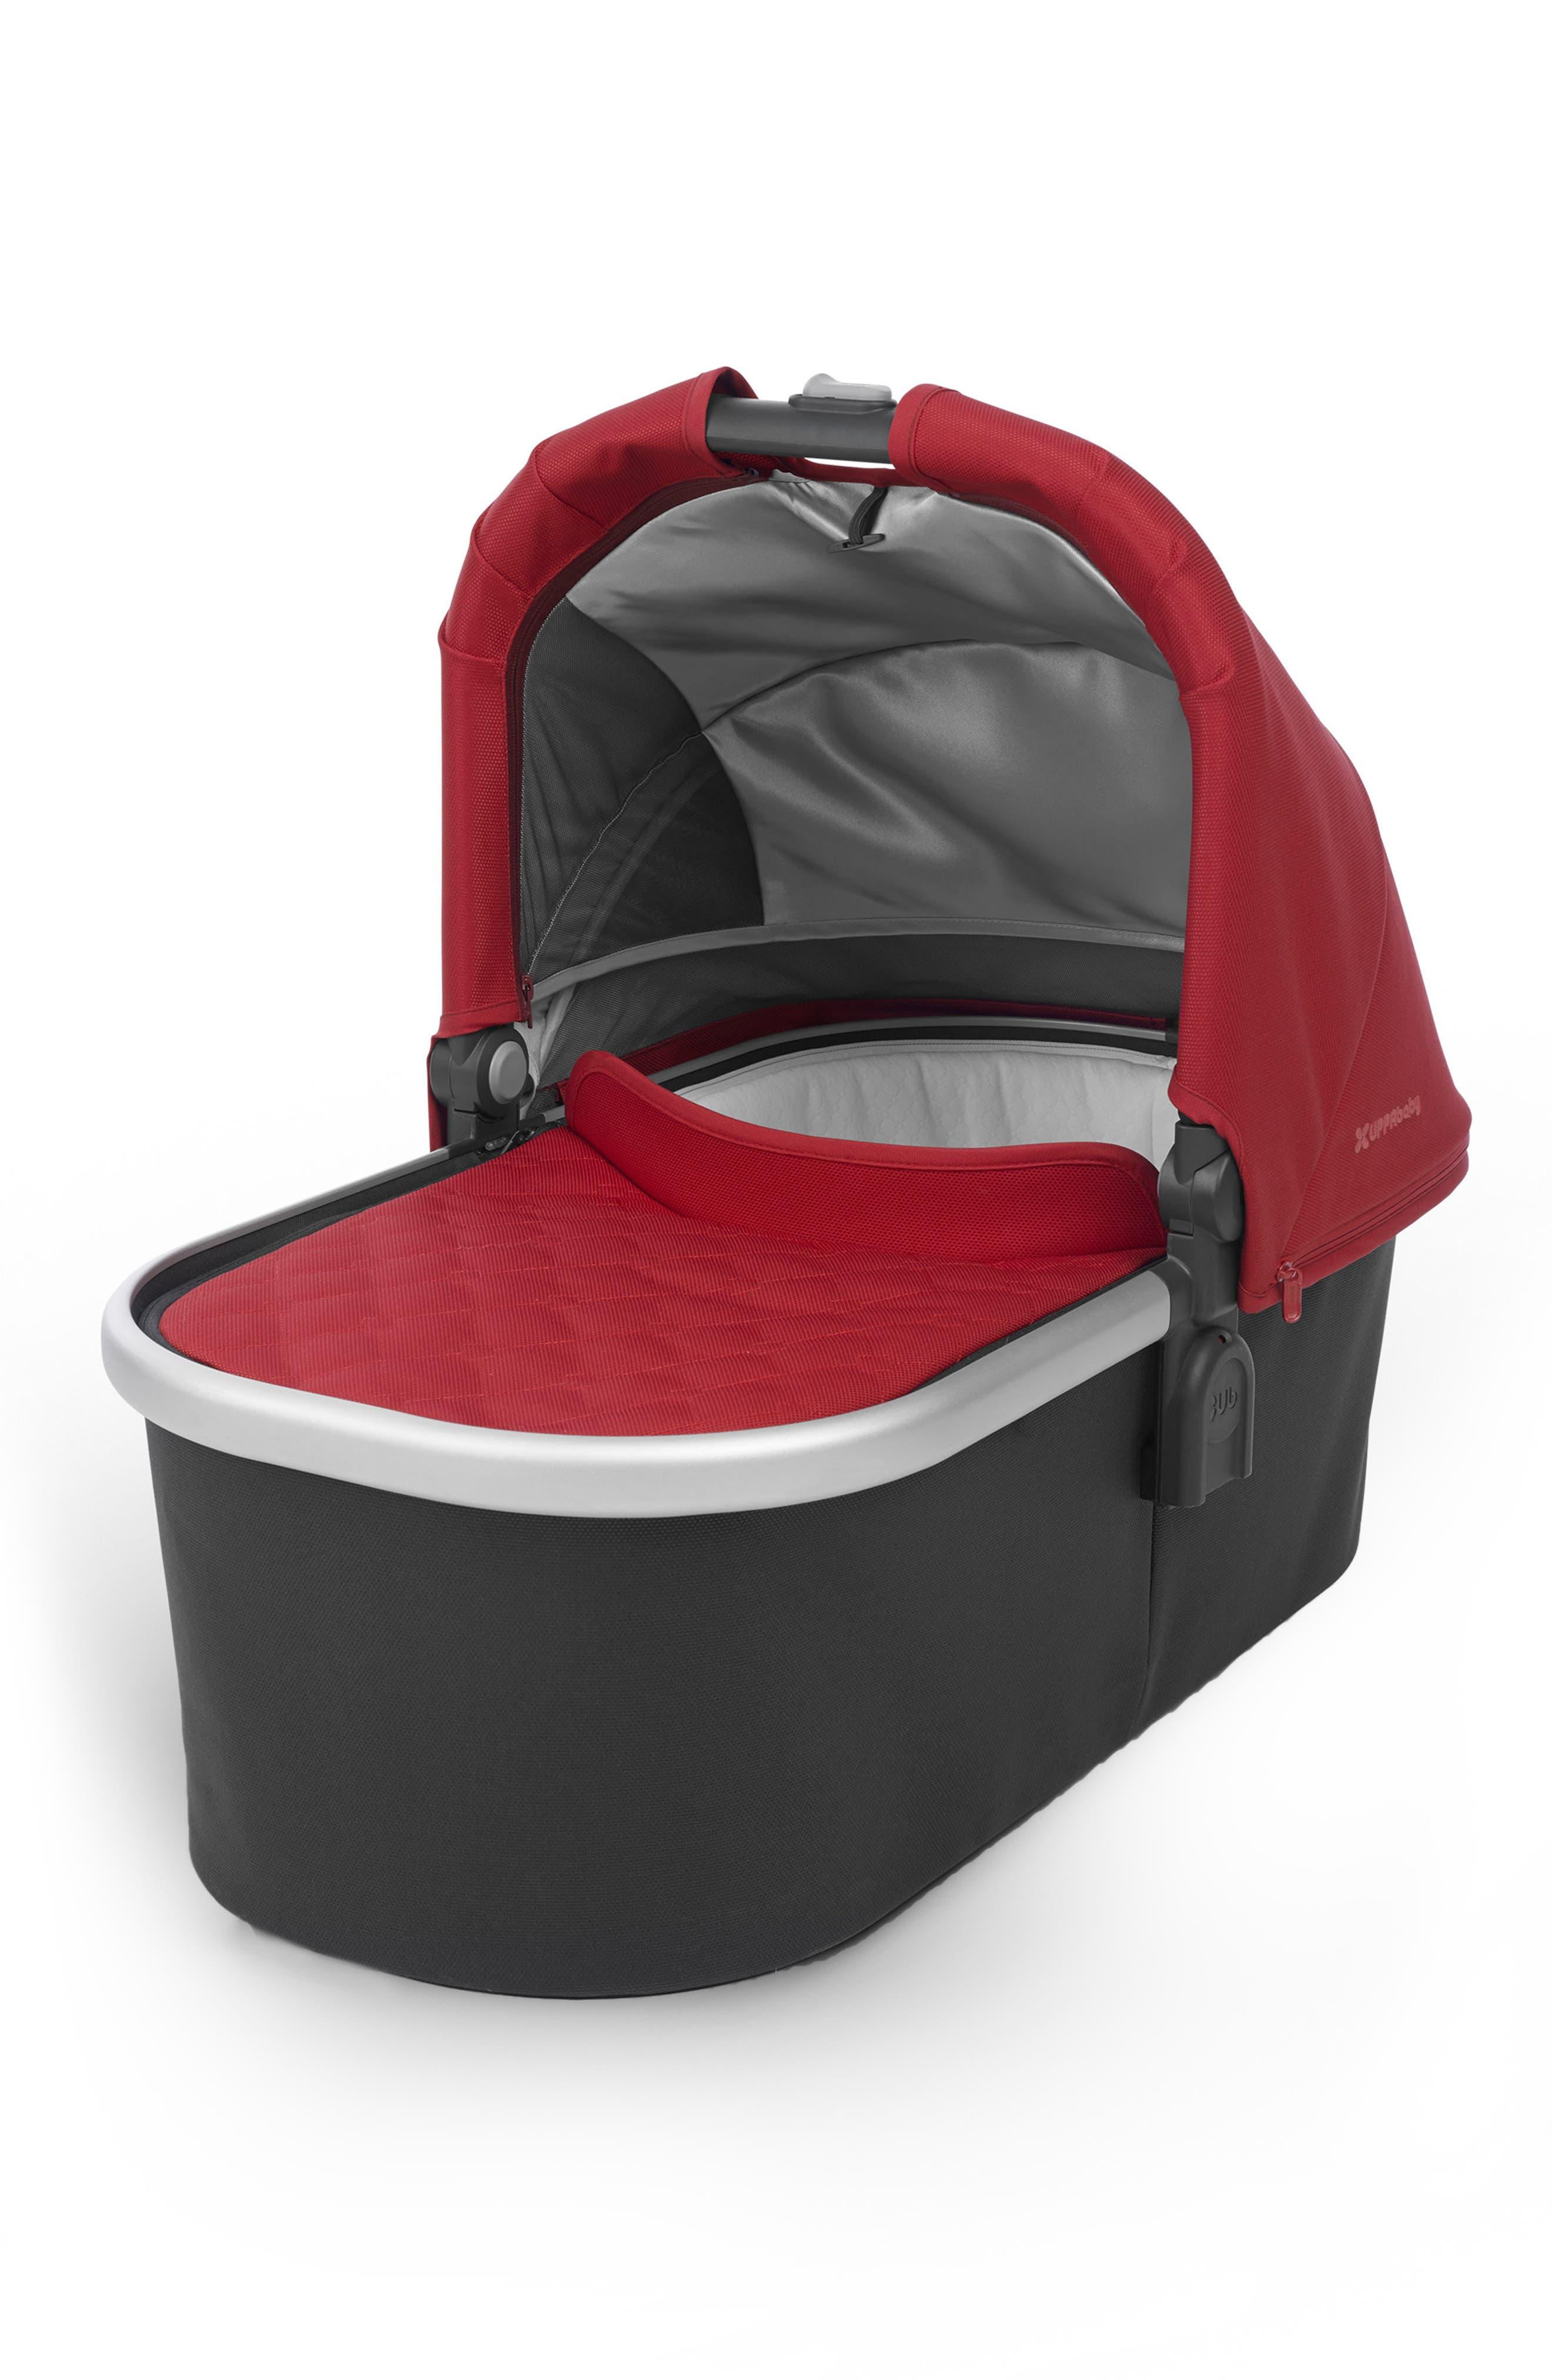 2018 Bassinet for CRUZ or VISTA Strollers,                         Main,                         color, Denny Red/ Silver